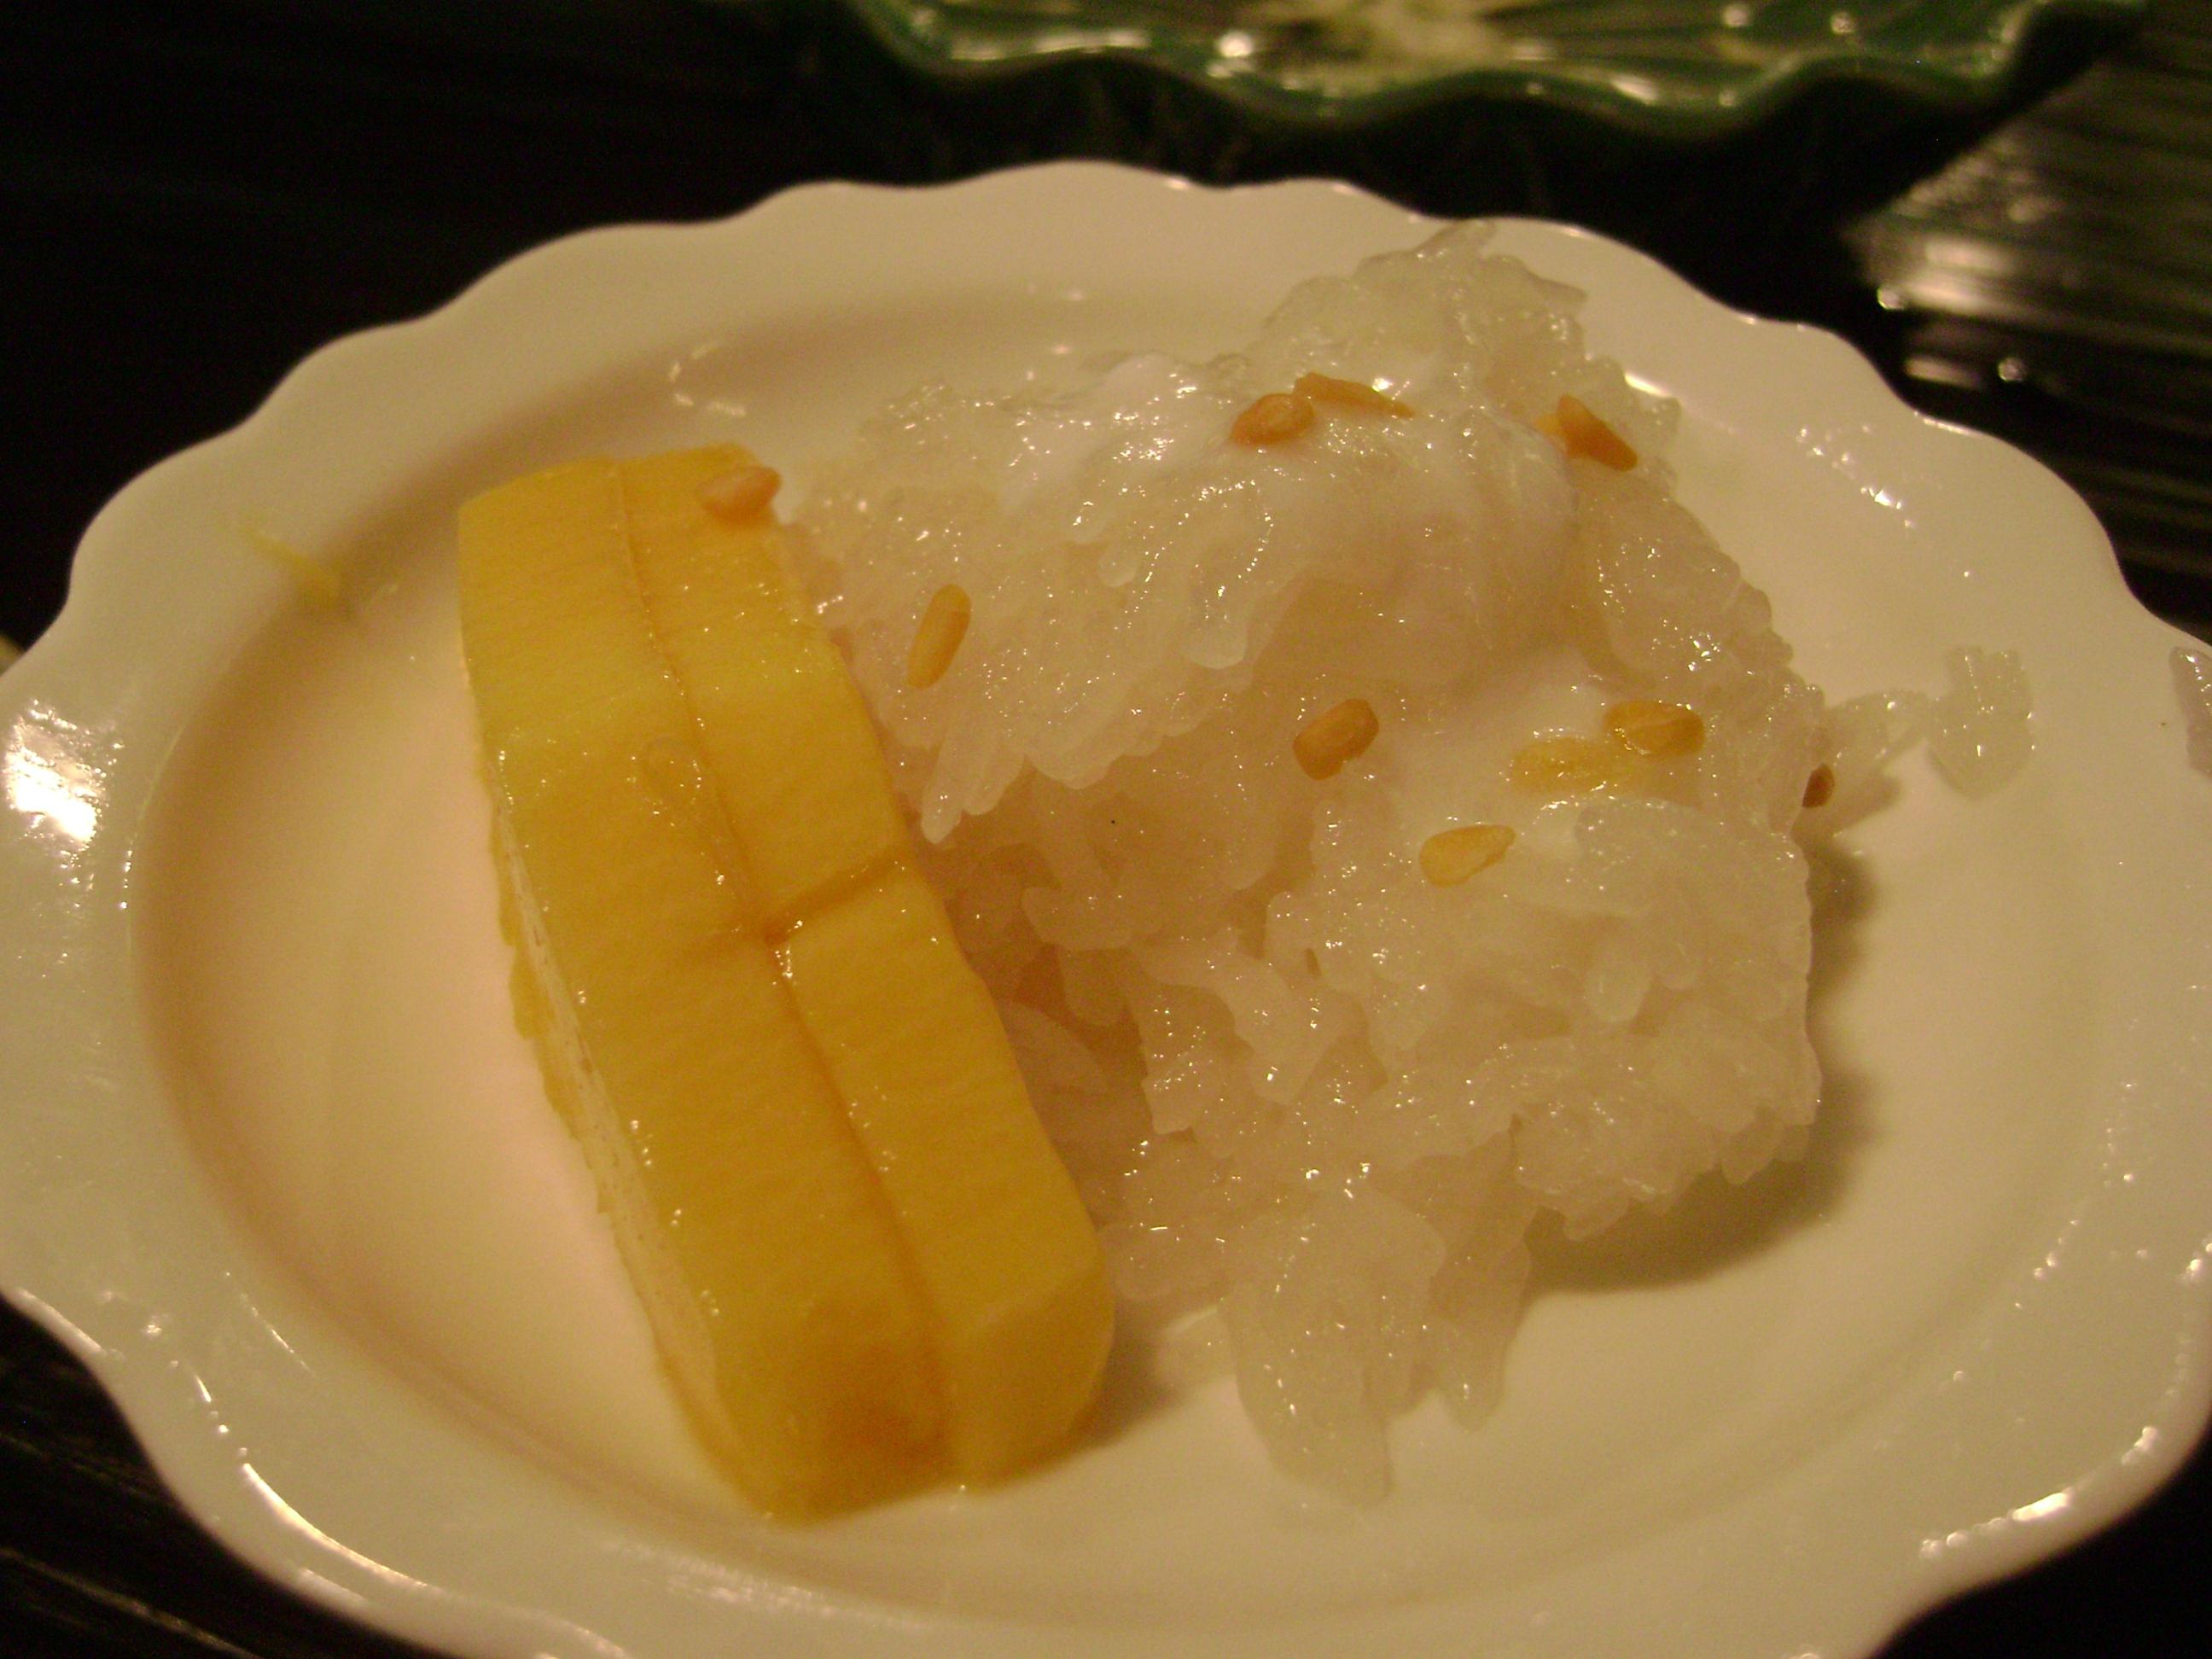 mango & sticky rice belong together